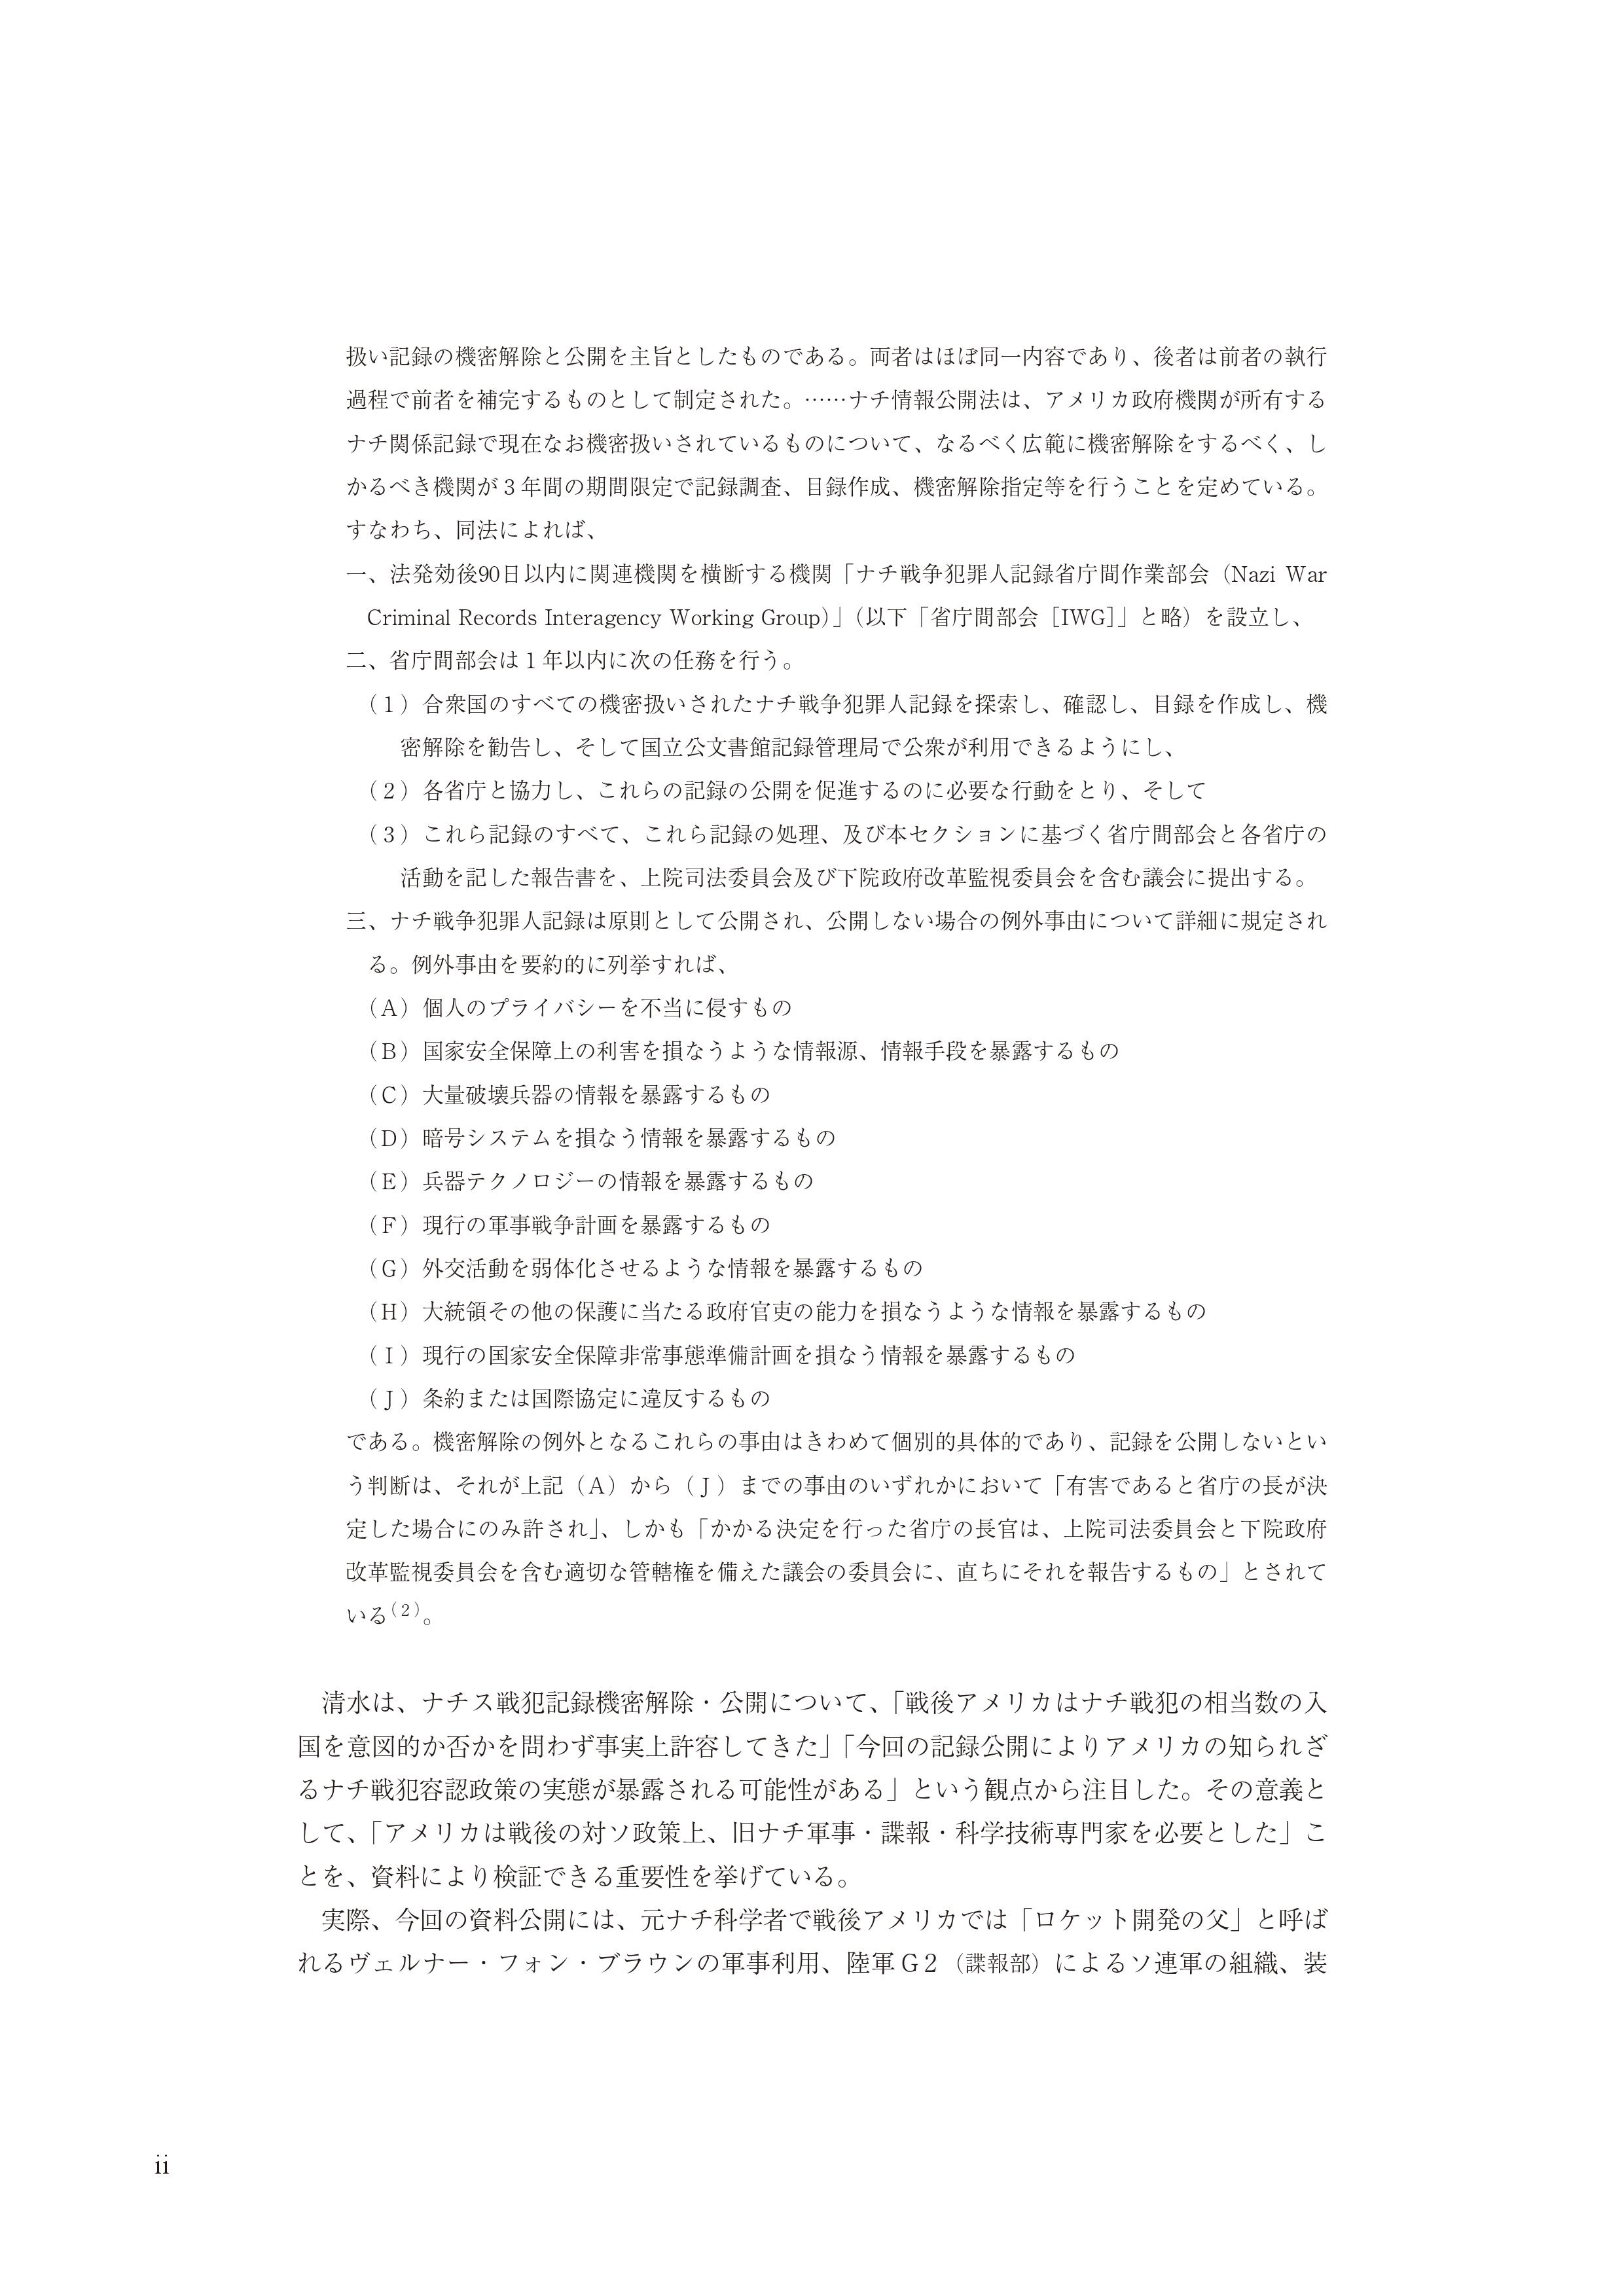 CIA日本人ファイル0001 (2)